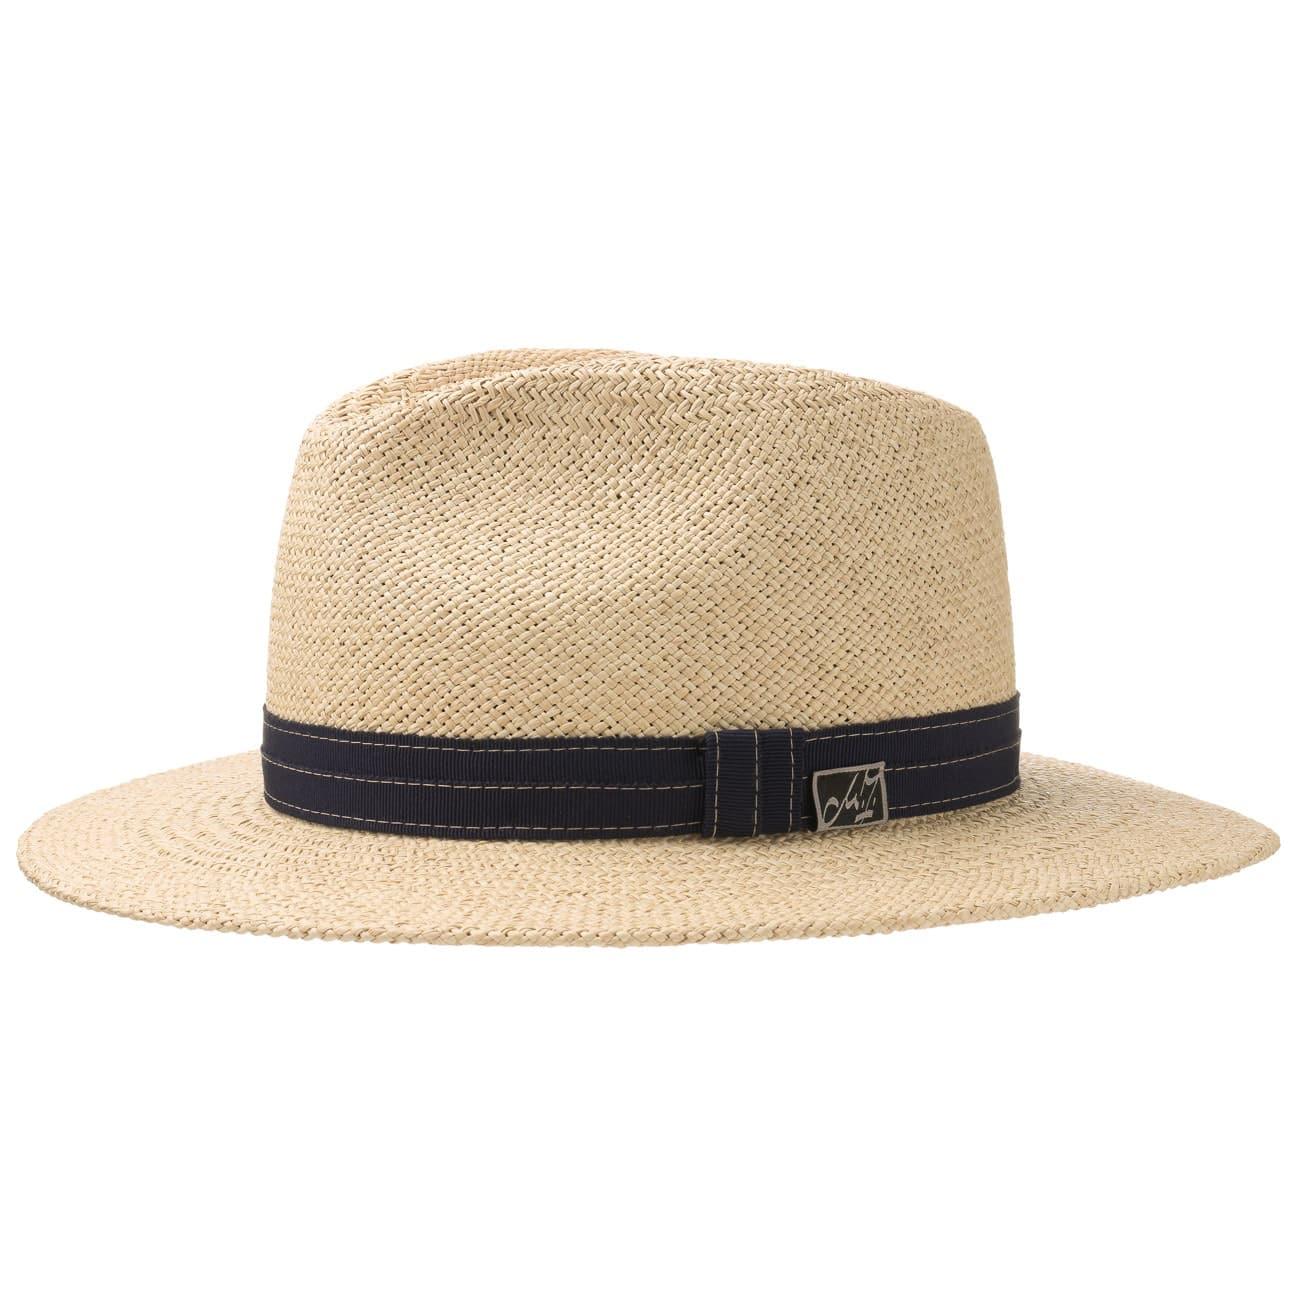 Sombrero Panam? Andrew Blue by Michael Zechbauer  sombrero